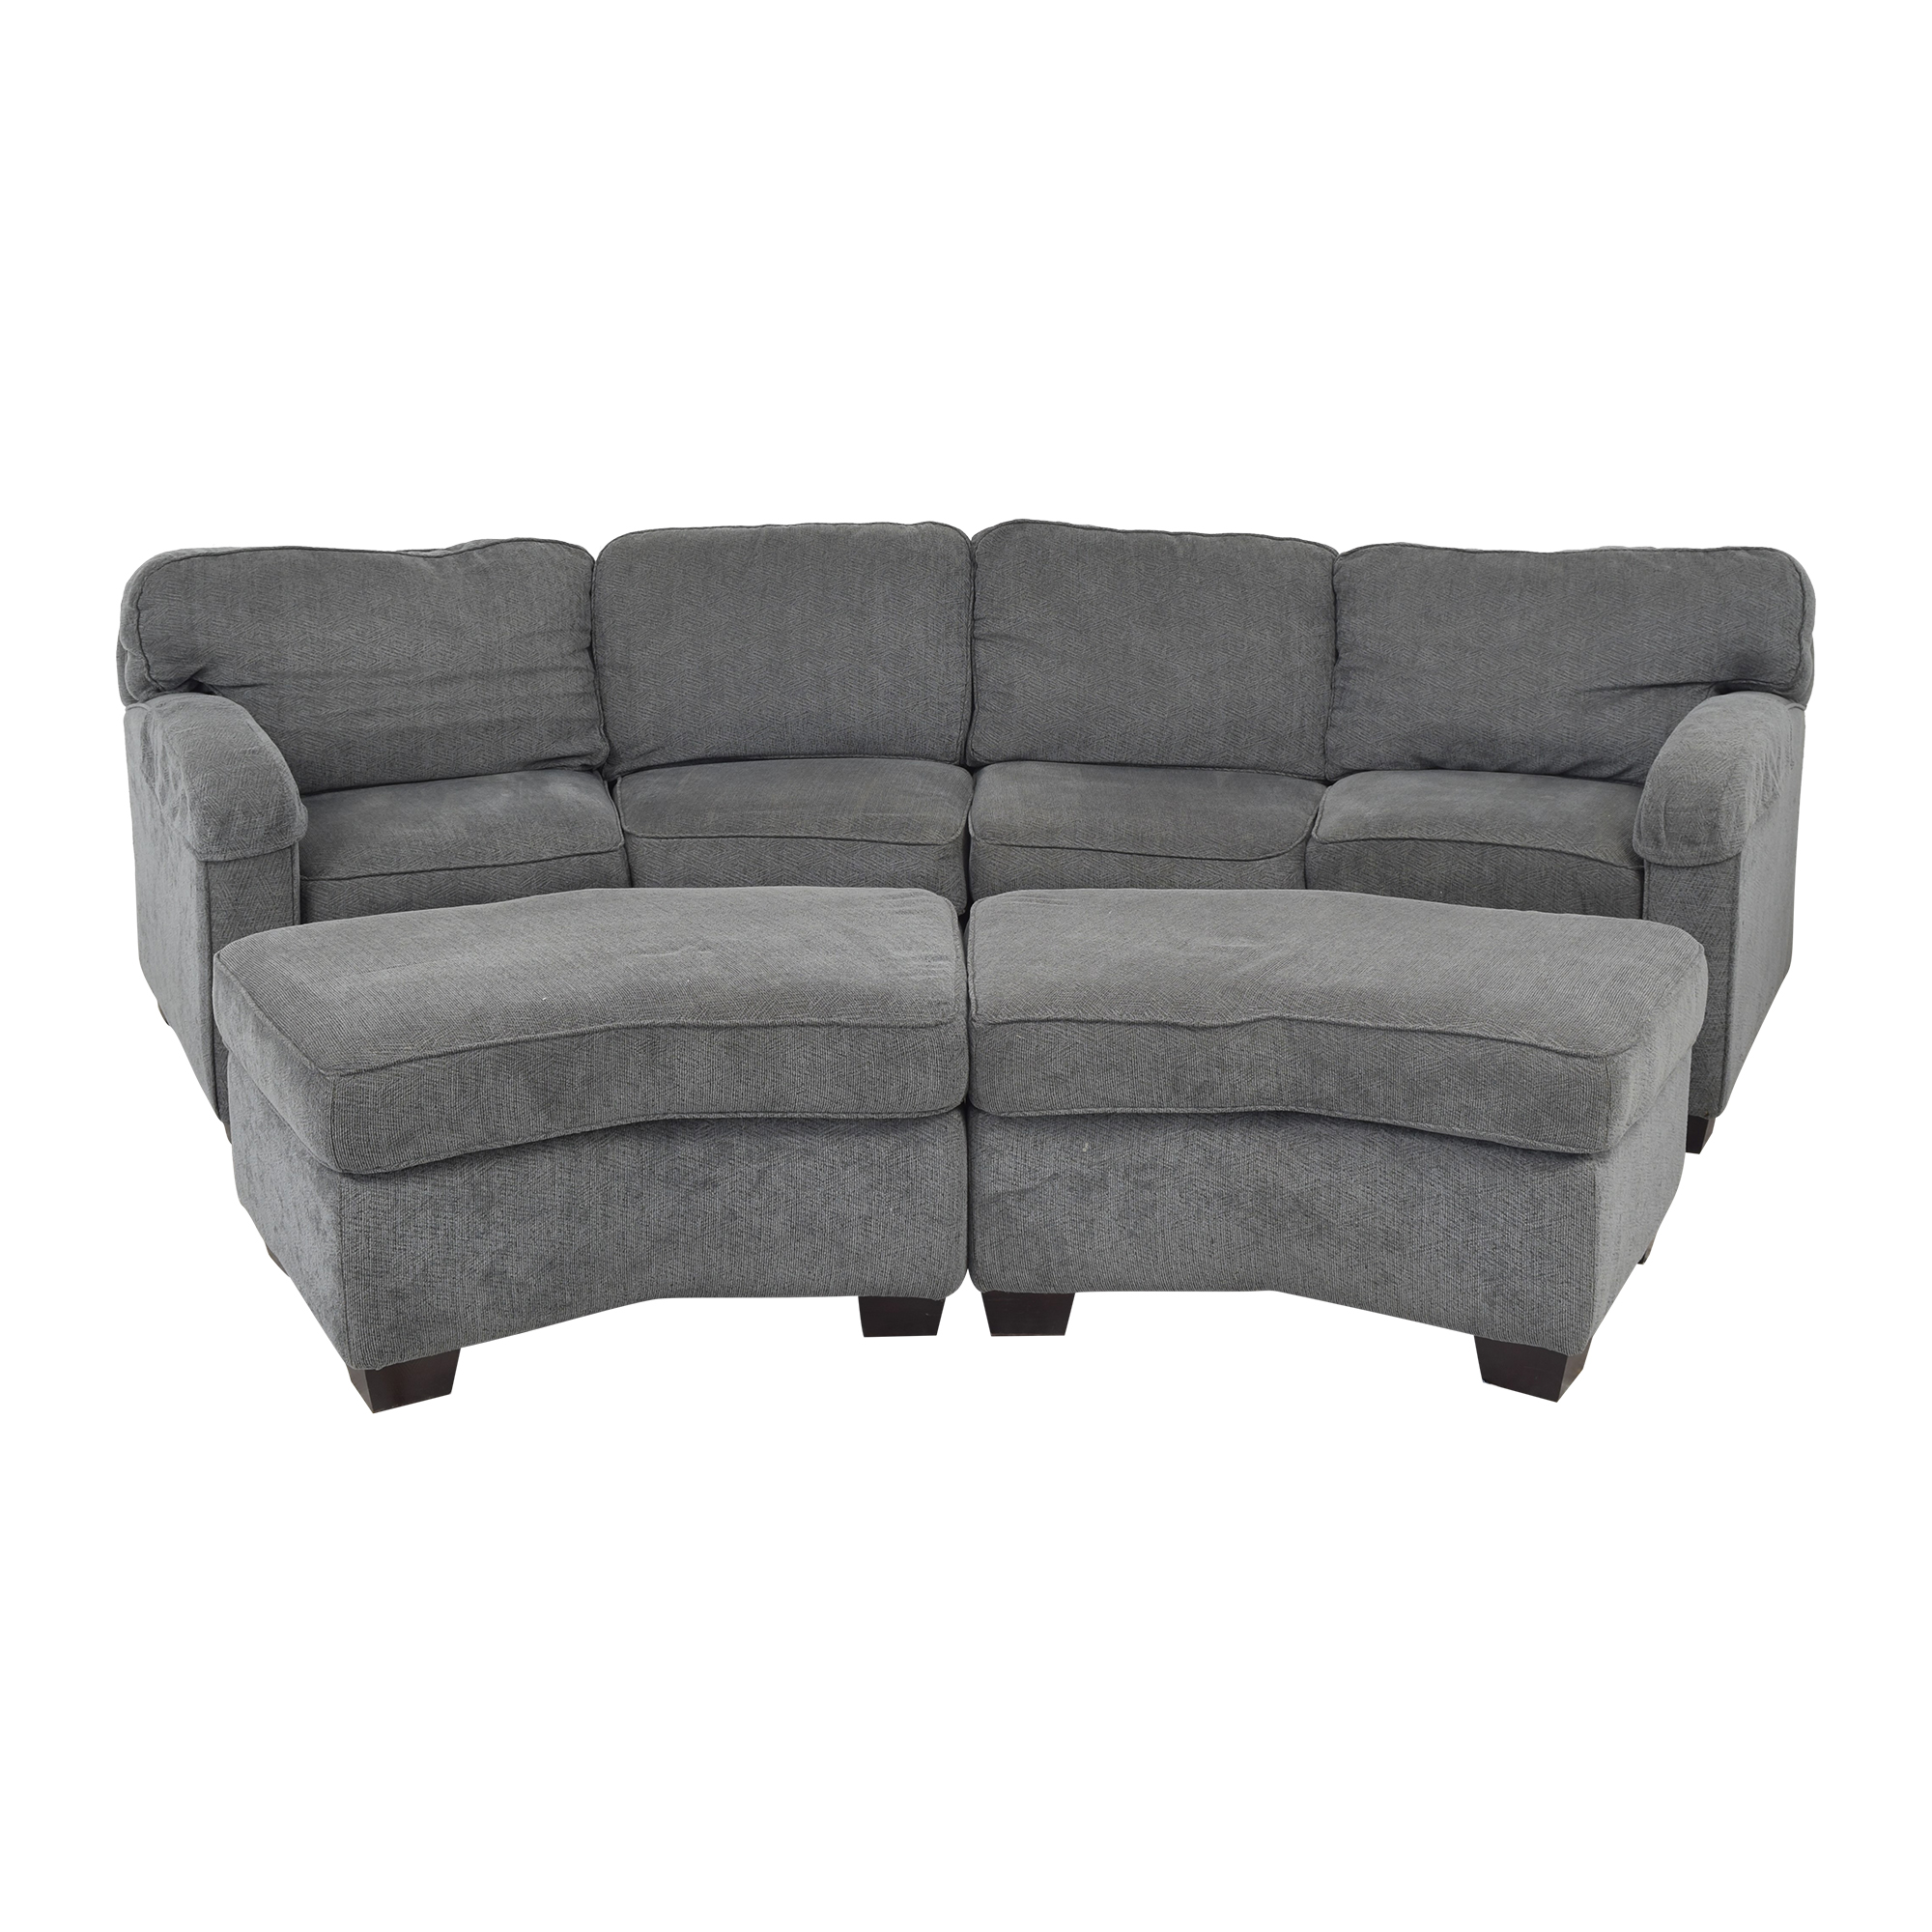 Bassett Furniture Bassett Furniture Sectional Sofa with Ottomans nyc